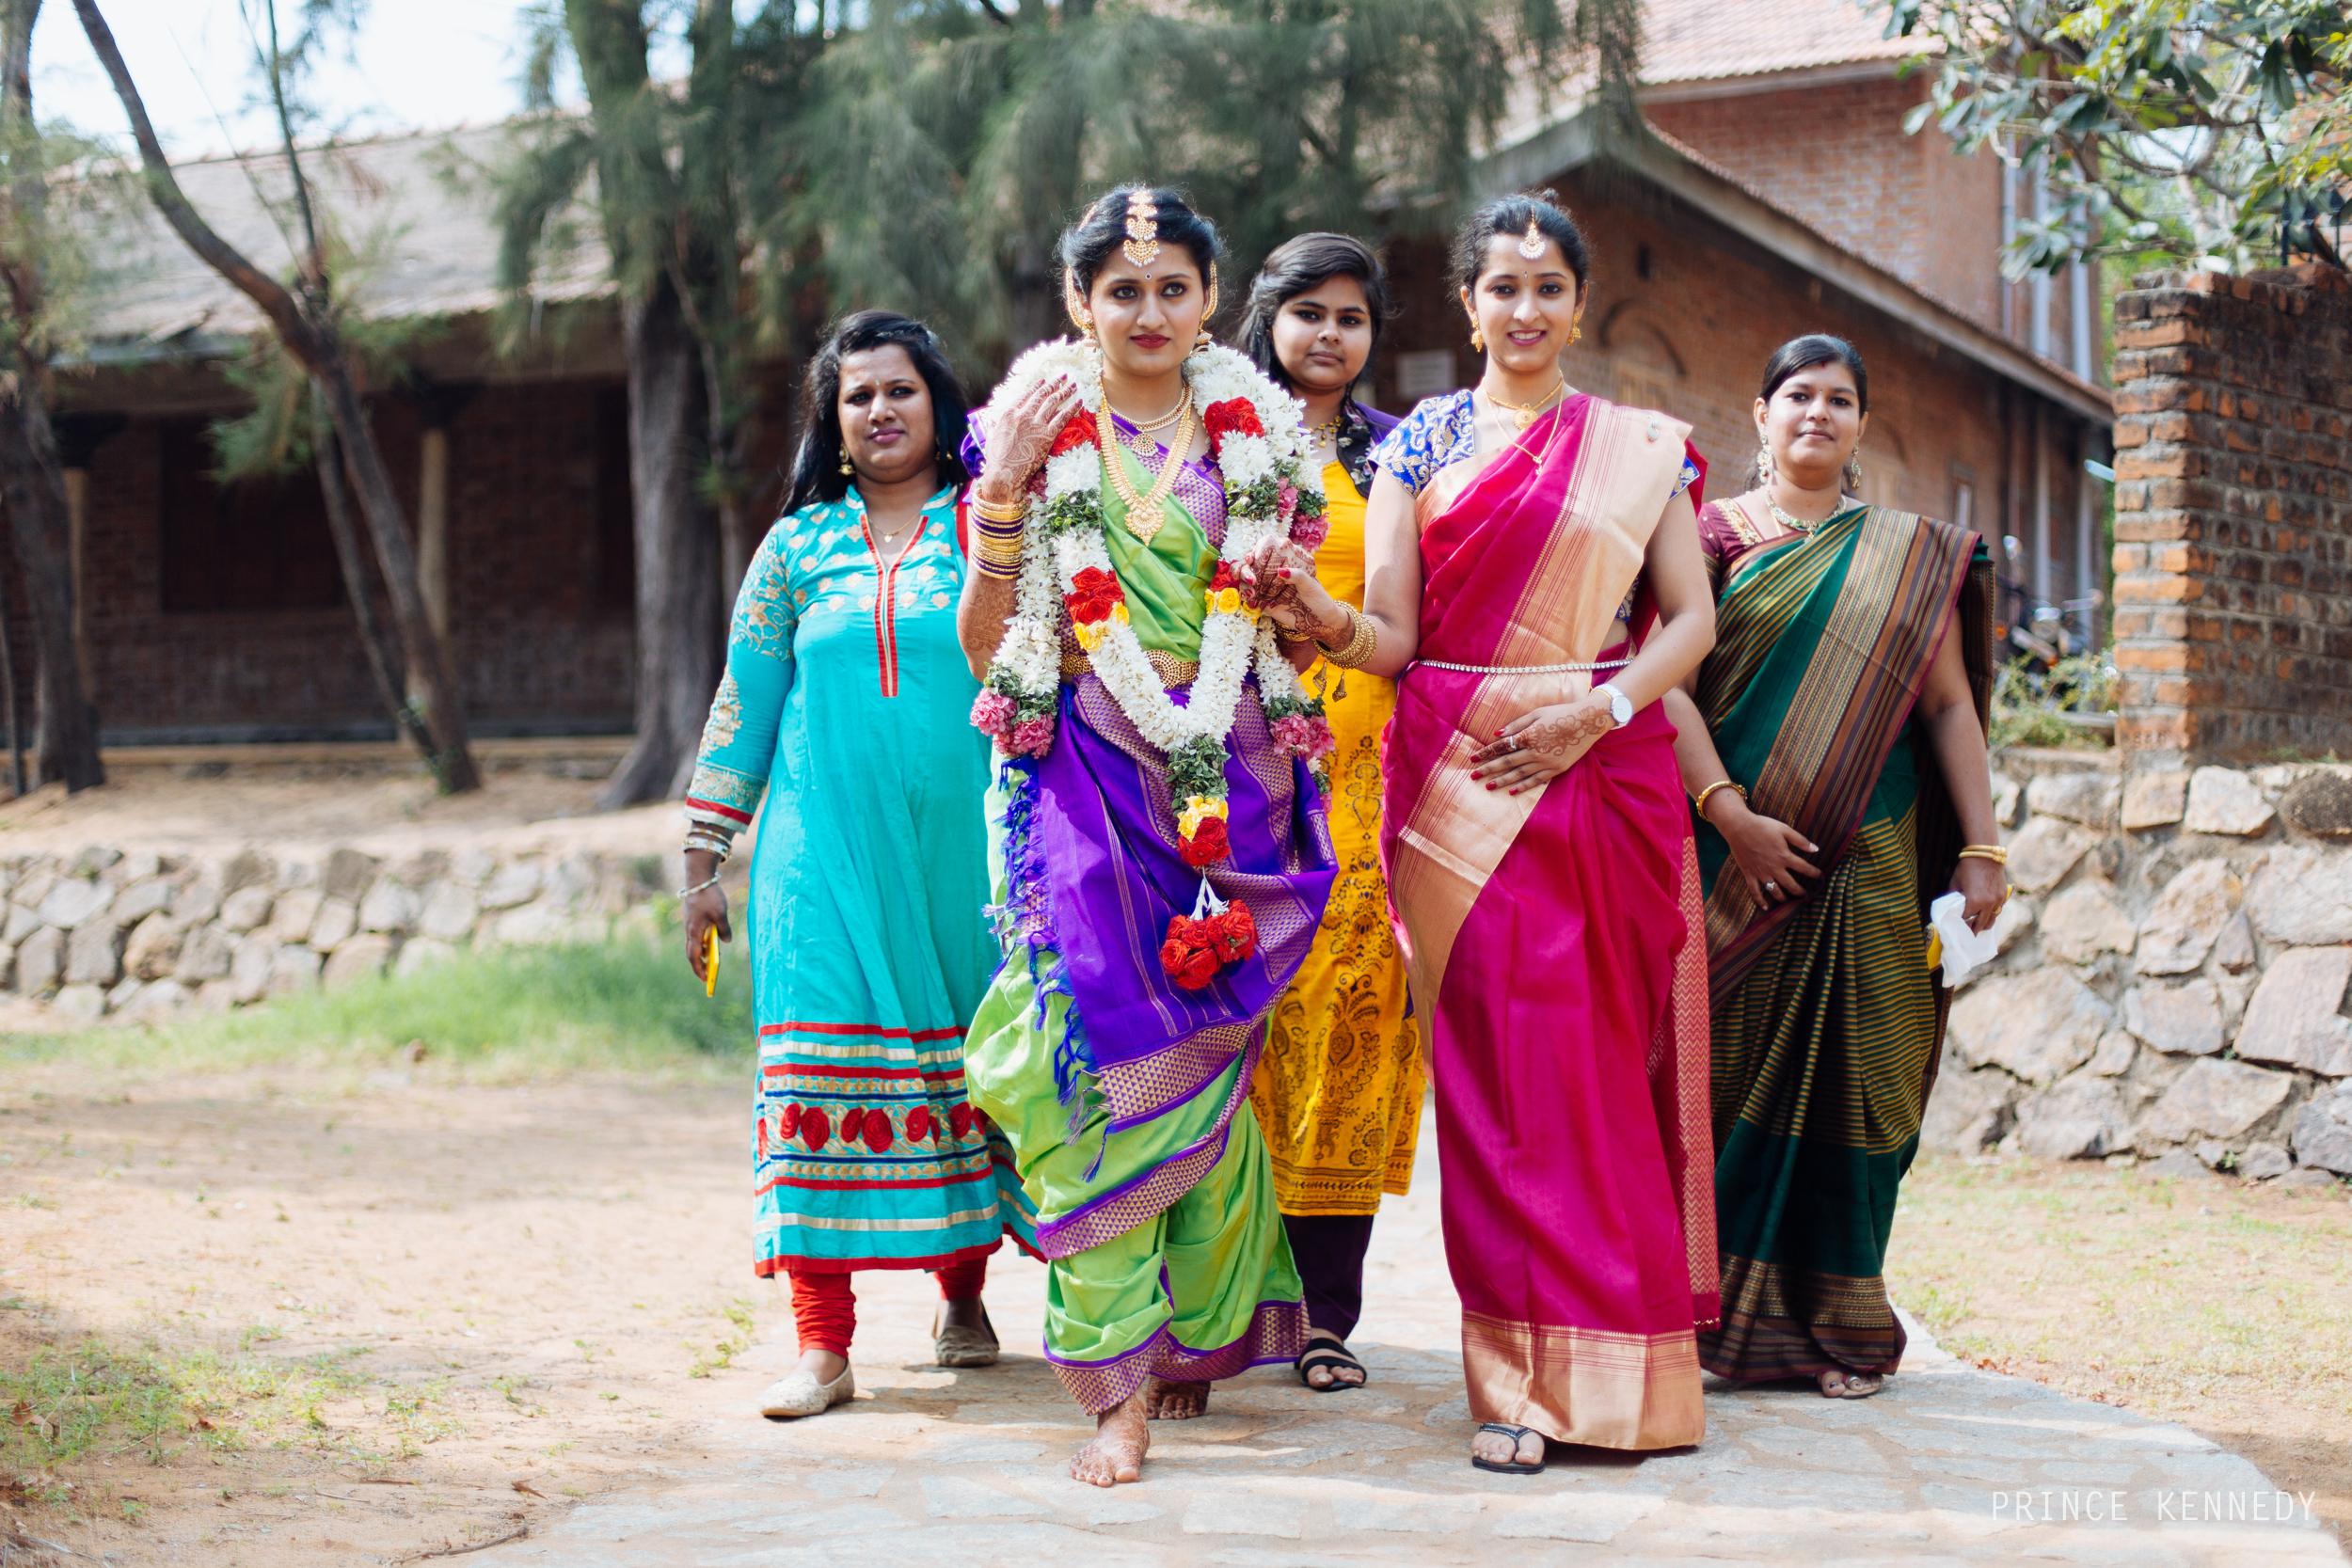 Athmajja-Nithesh-Engagement-Couple-Portrait-Portraiture-Wedding-Couple-Portrait-Chennai-Photographer-Candid-Photography-Destination-Best-Prince-Kennedy-Photography-260.jpg